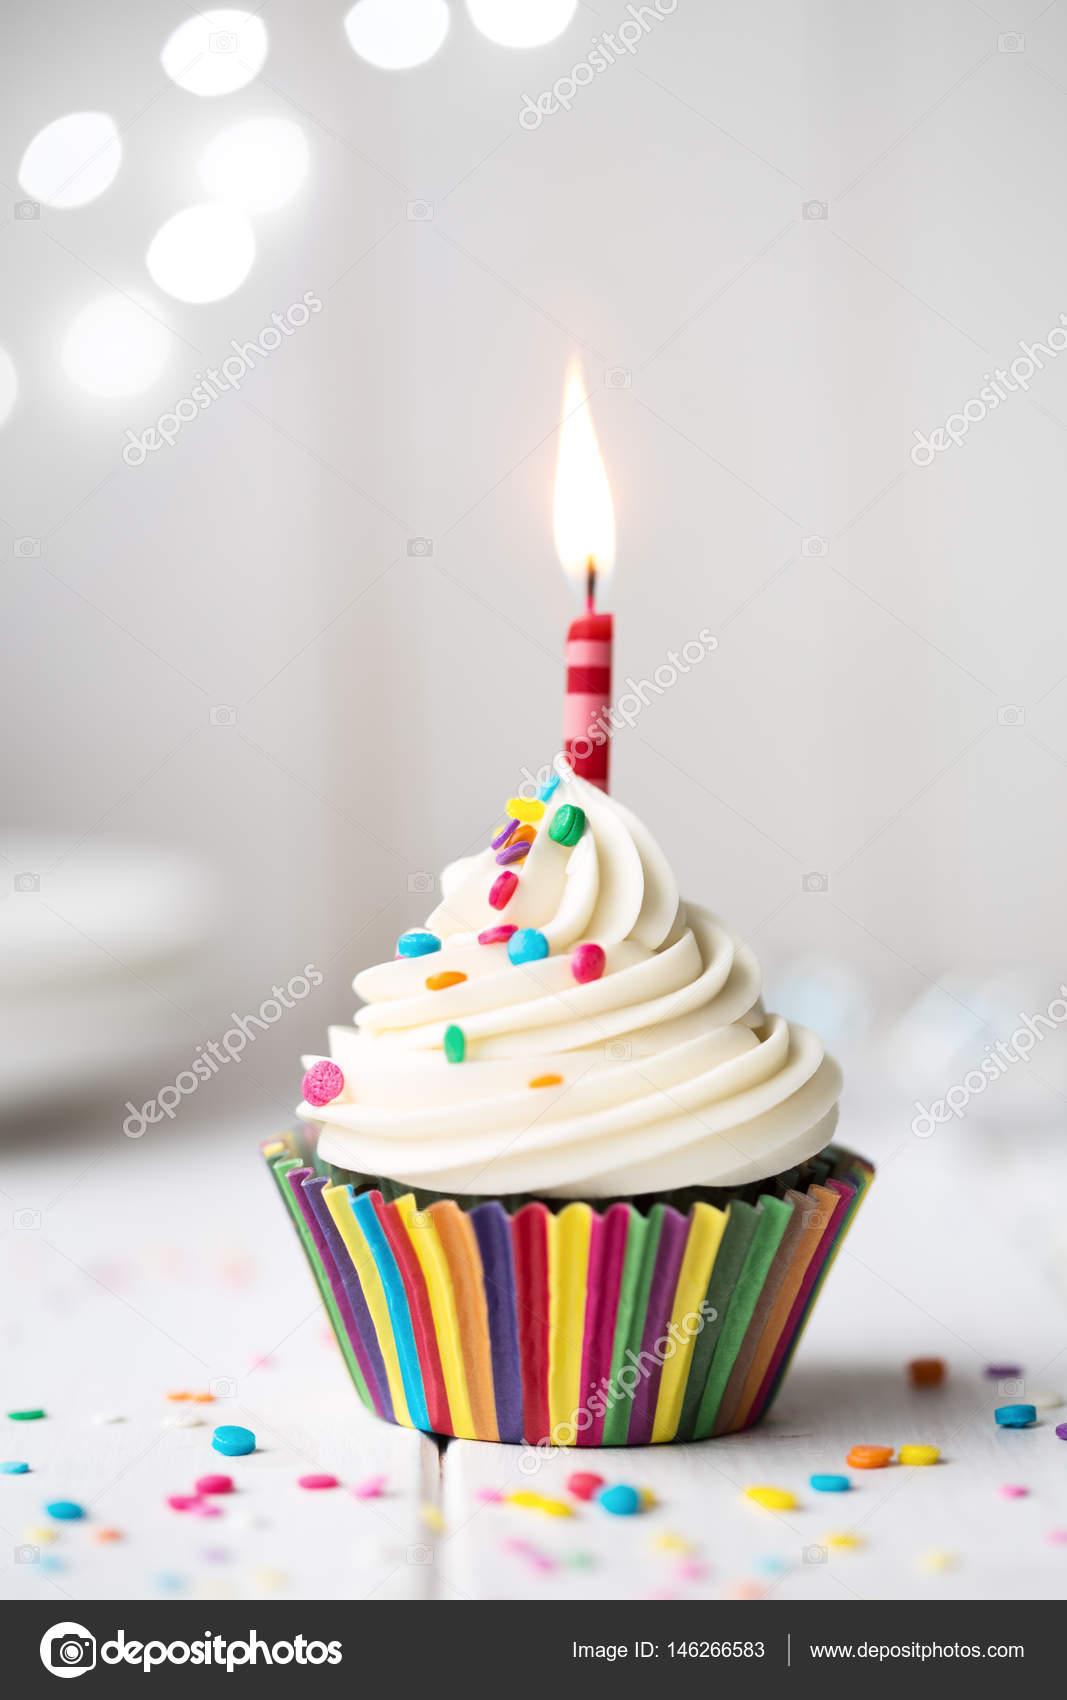 Geburtstag Cupcake Mit Kerze Stockfoto C Ruthblack 146266583